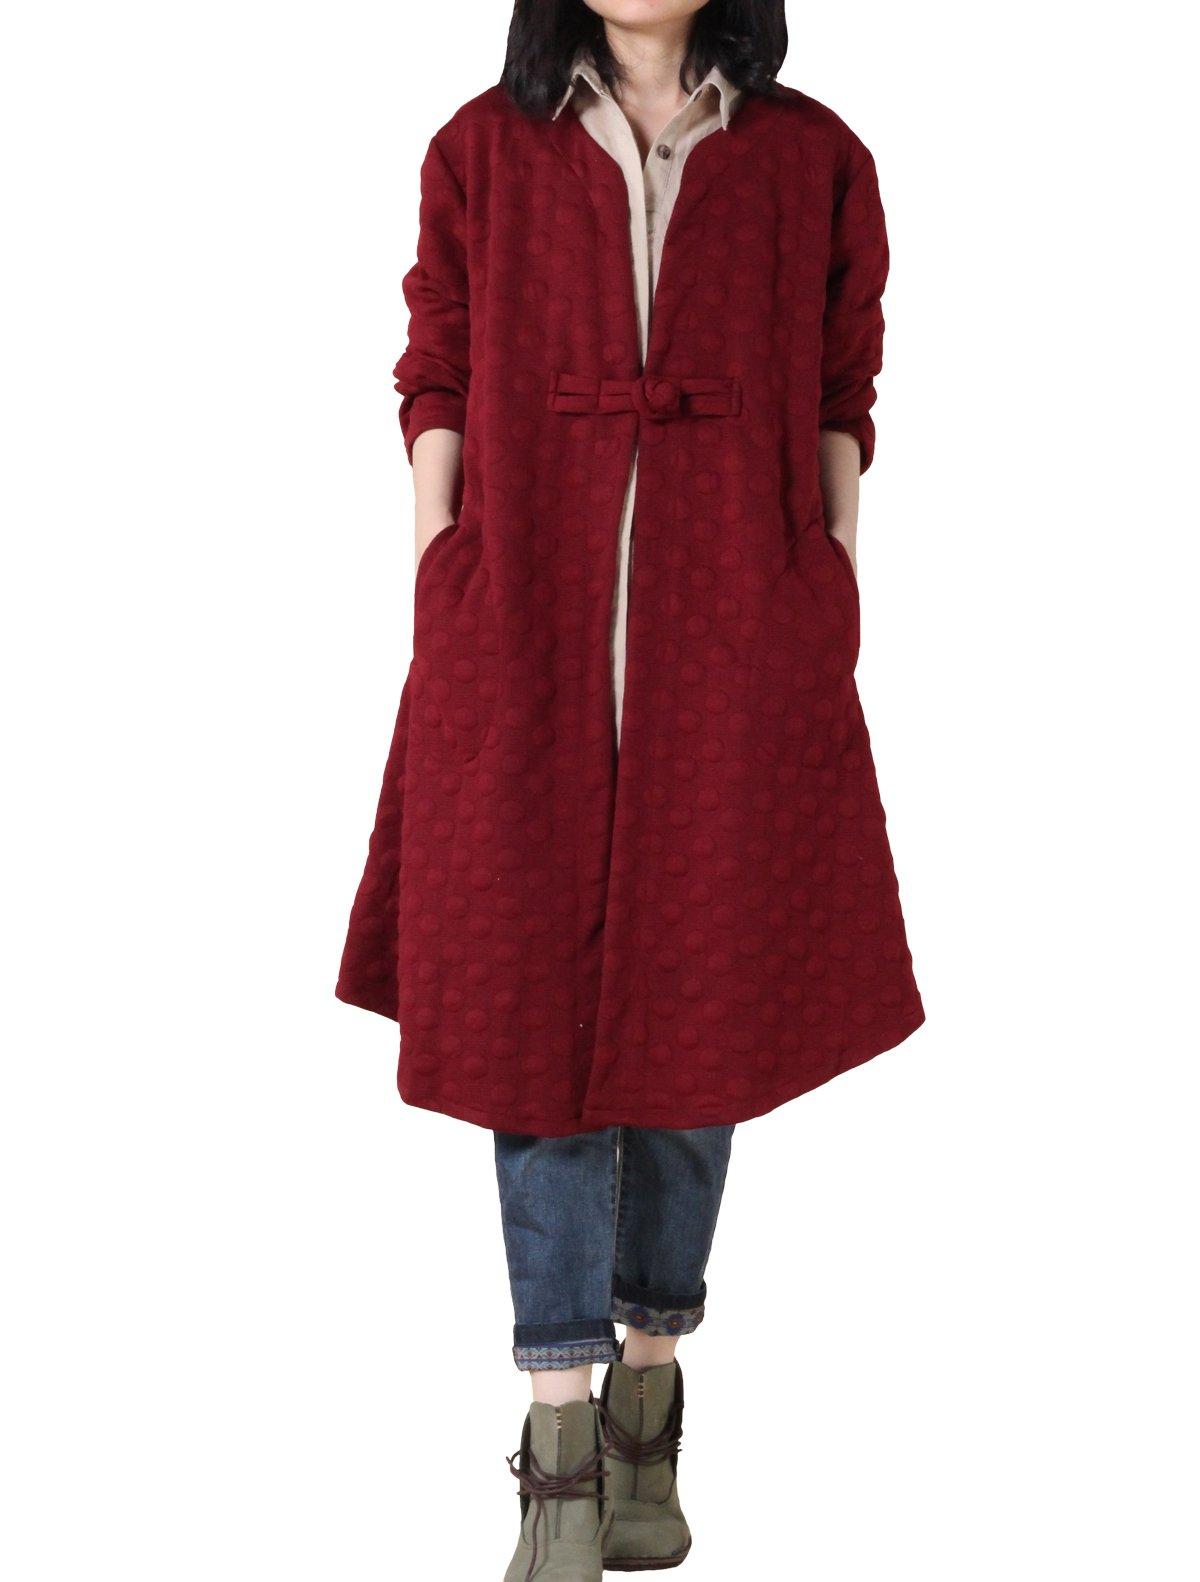 Minibee Women's Autumn Jacquard Classic Button Coat Style 1 Wine L